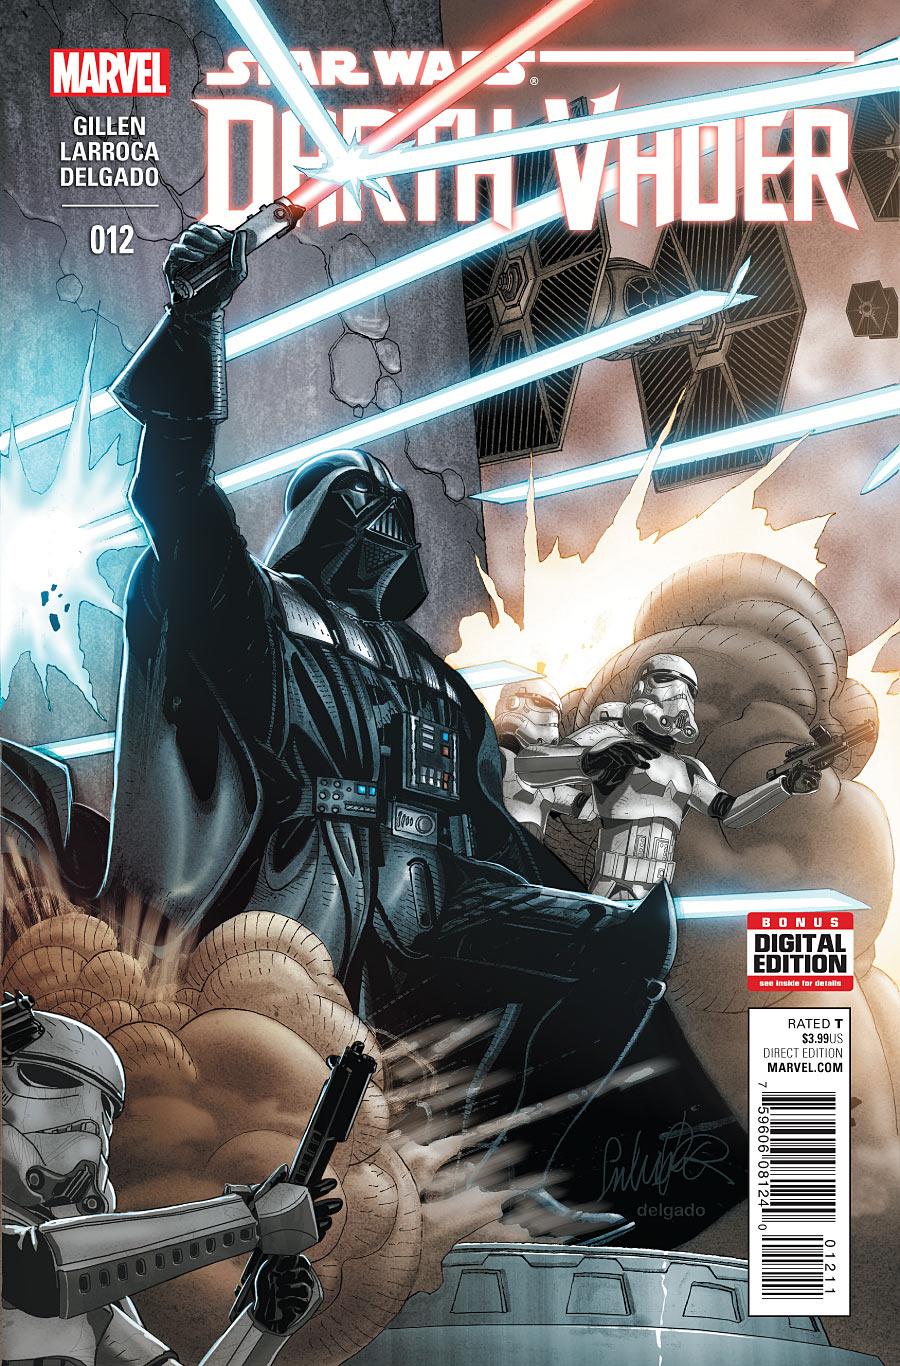 Star Wars - Darth Vader 12 - Book II, Part VI: Shadows and Secrets